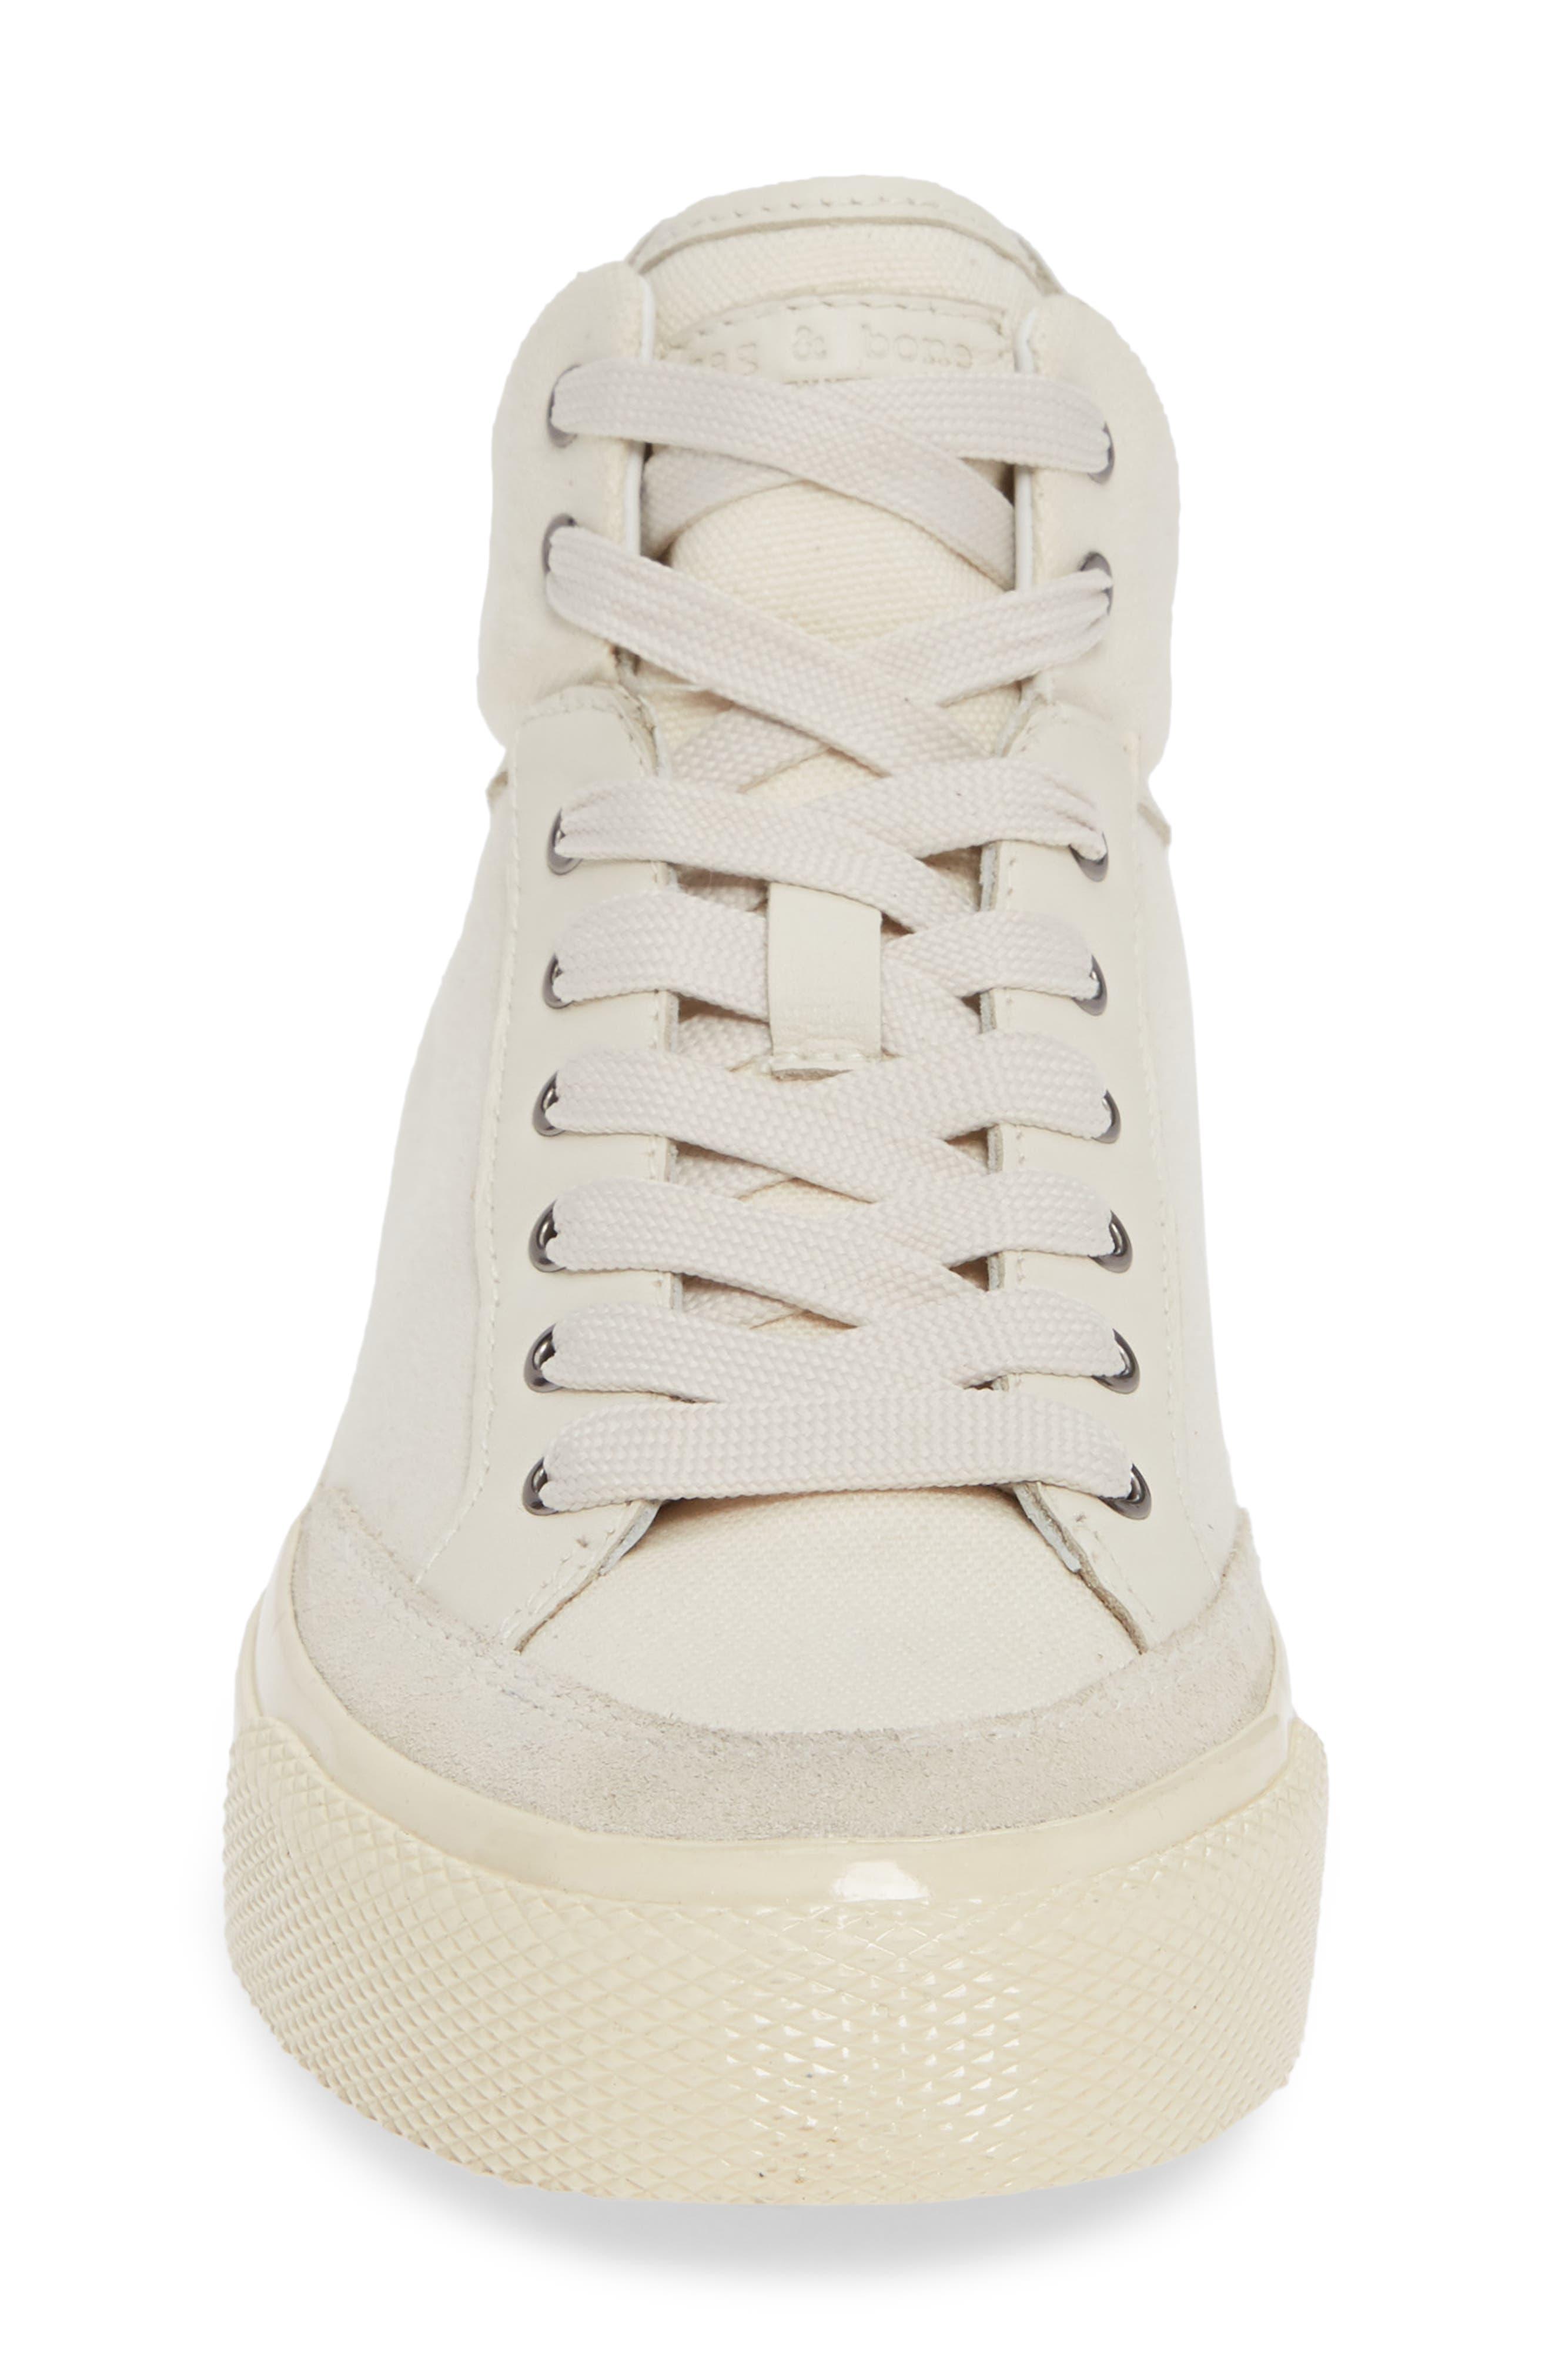 Army High Top Sneaker,                             Alternate thumbnail 4, color,                             ECRU CANVAS